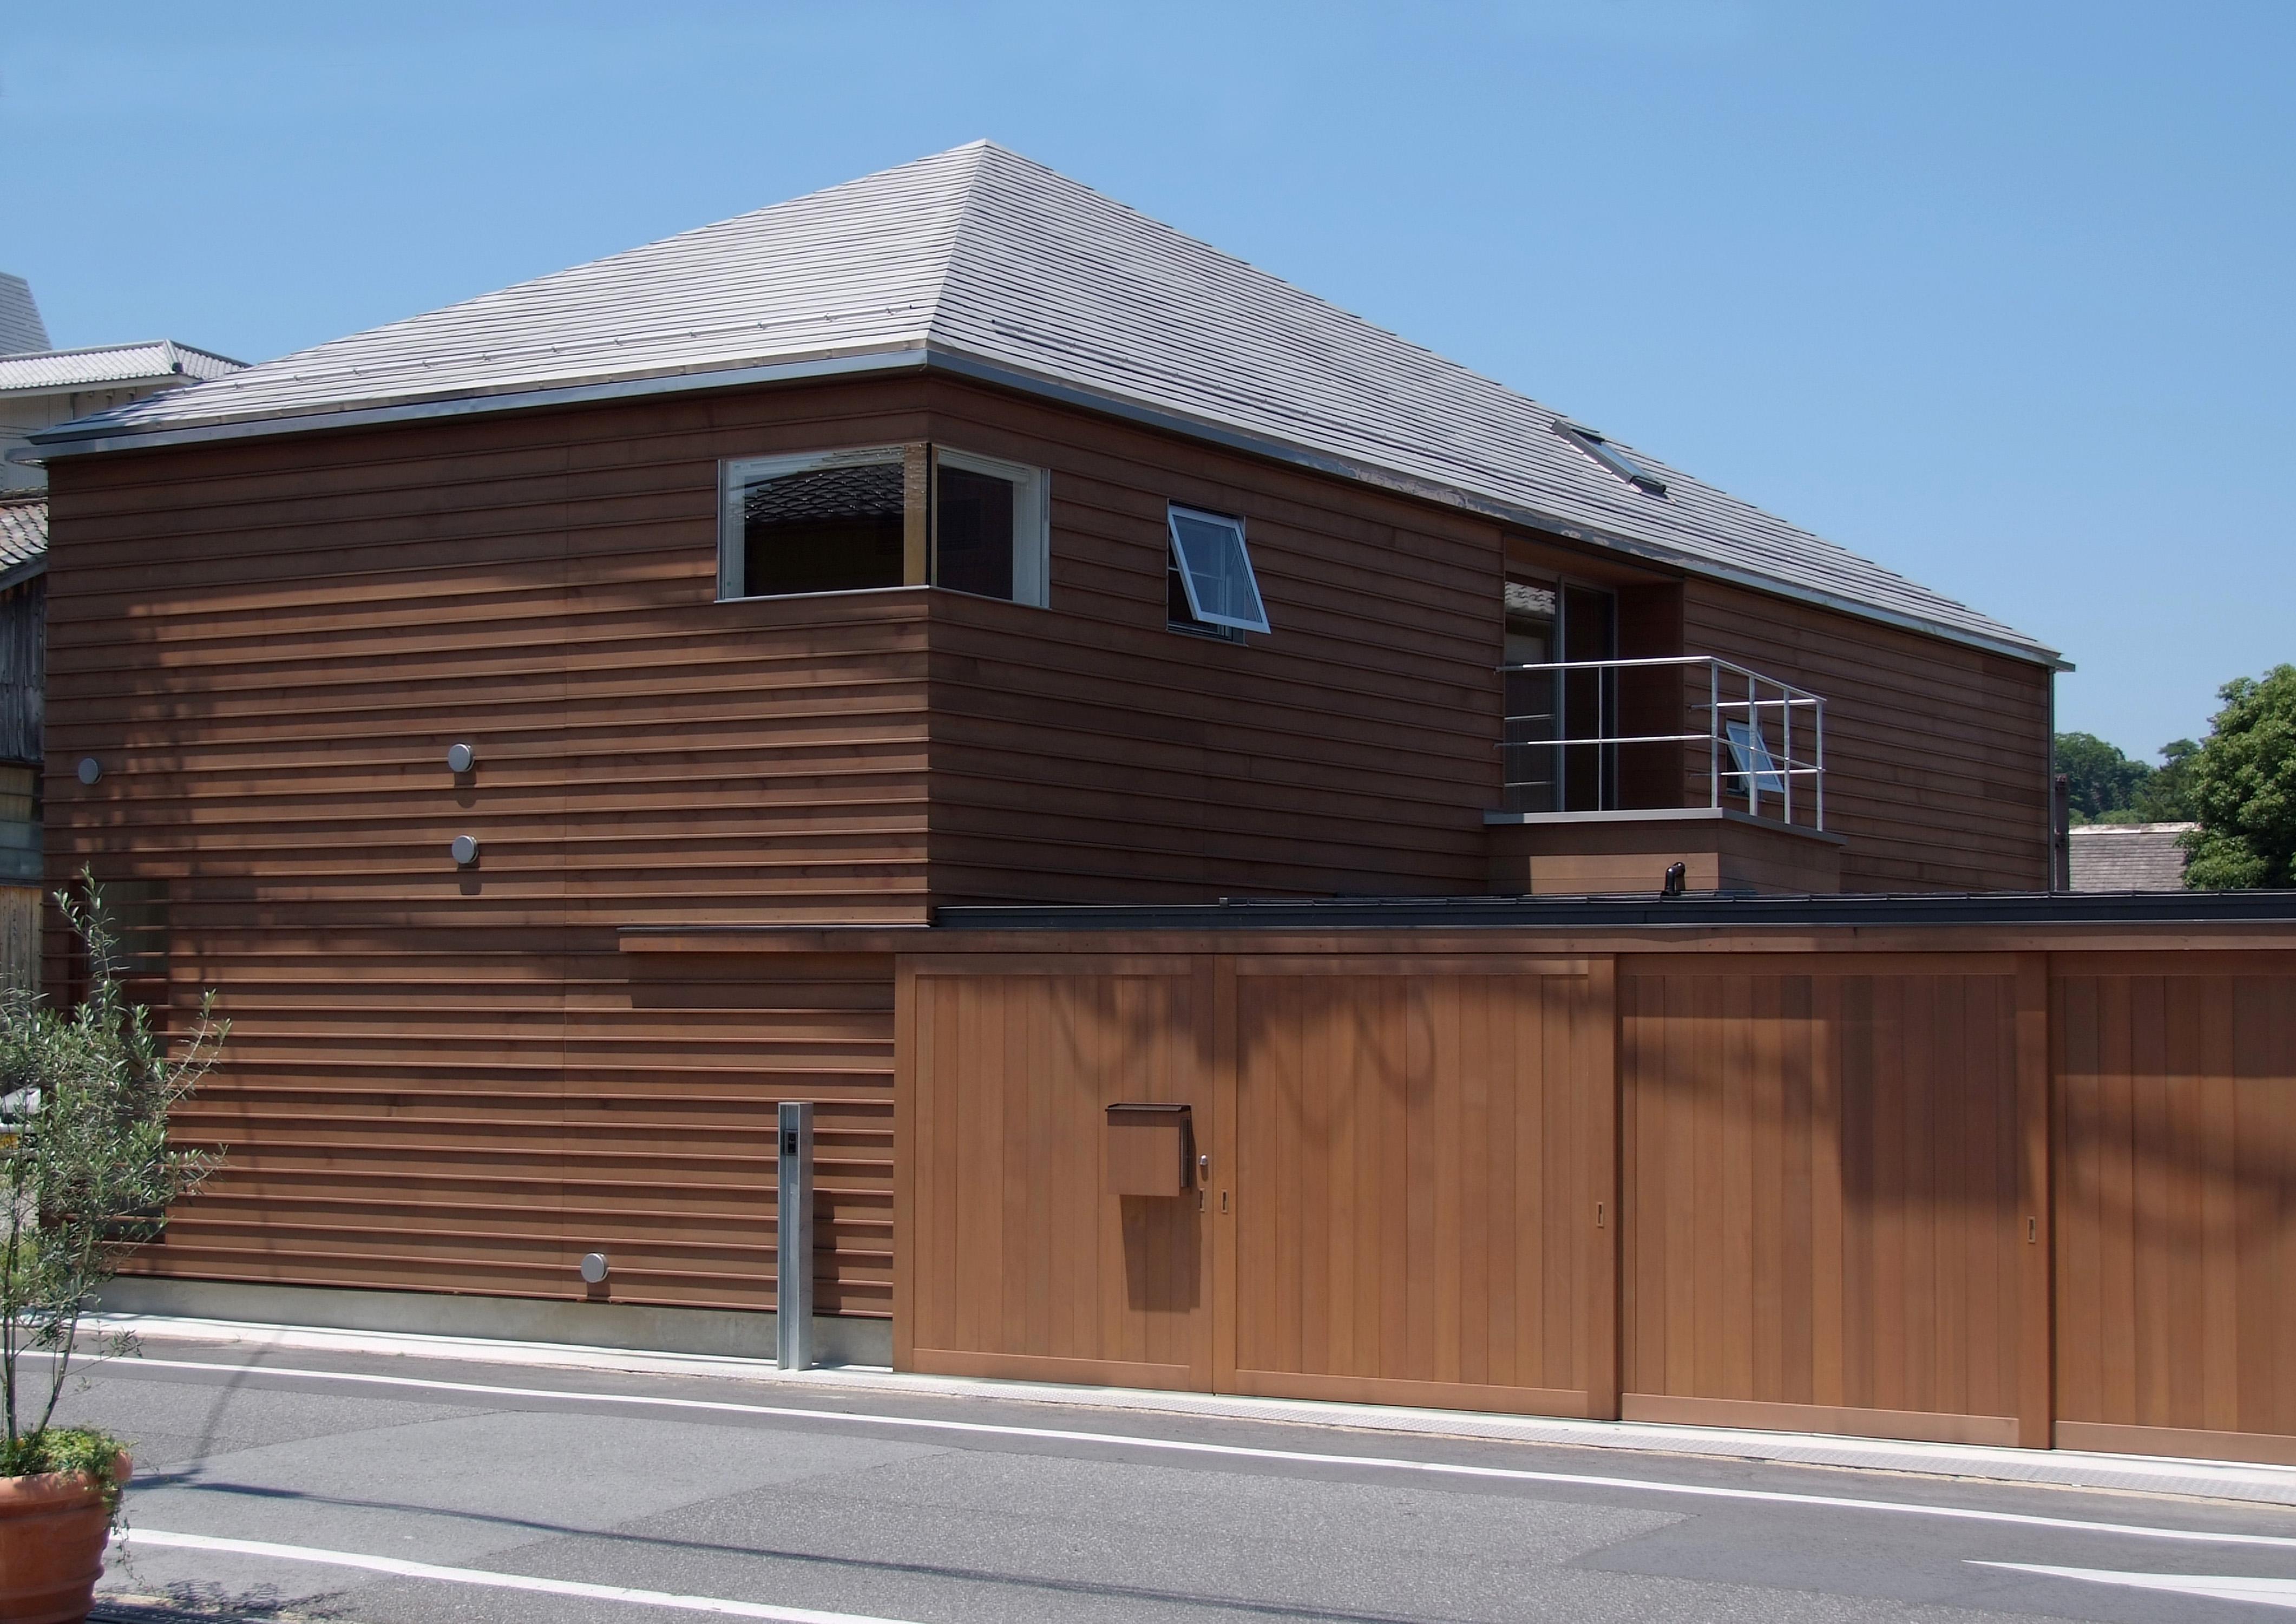 K邸(滋賀県彦根市)〈建築プロデュース〉